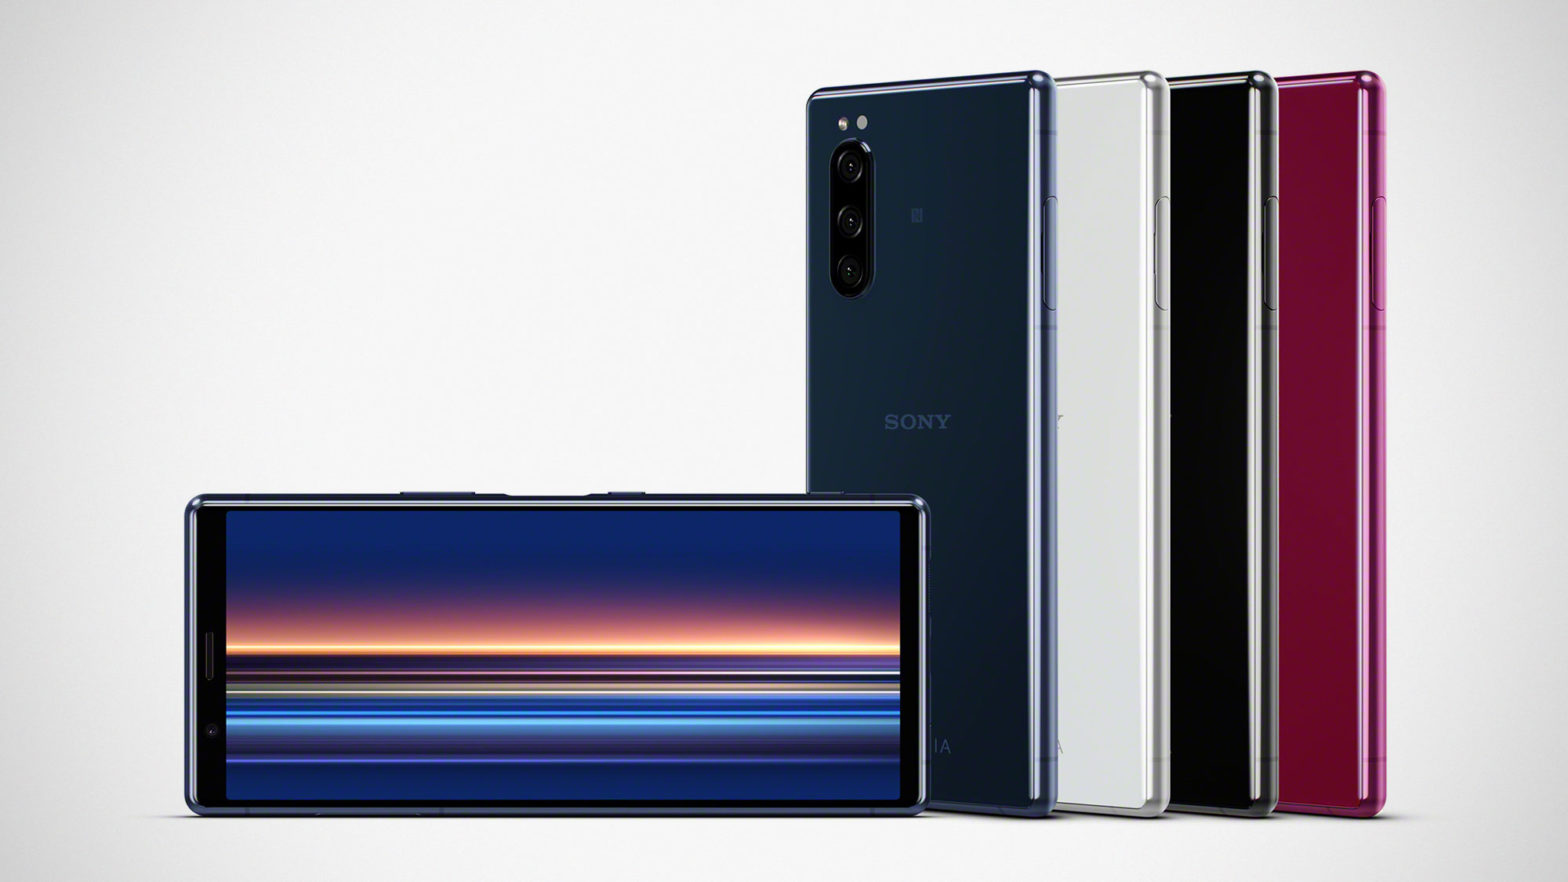 Sony Xperia 5 Smartphone Announced